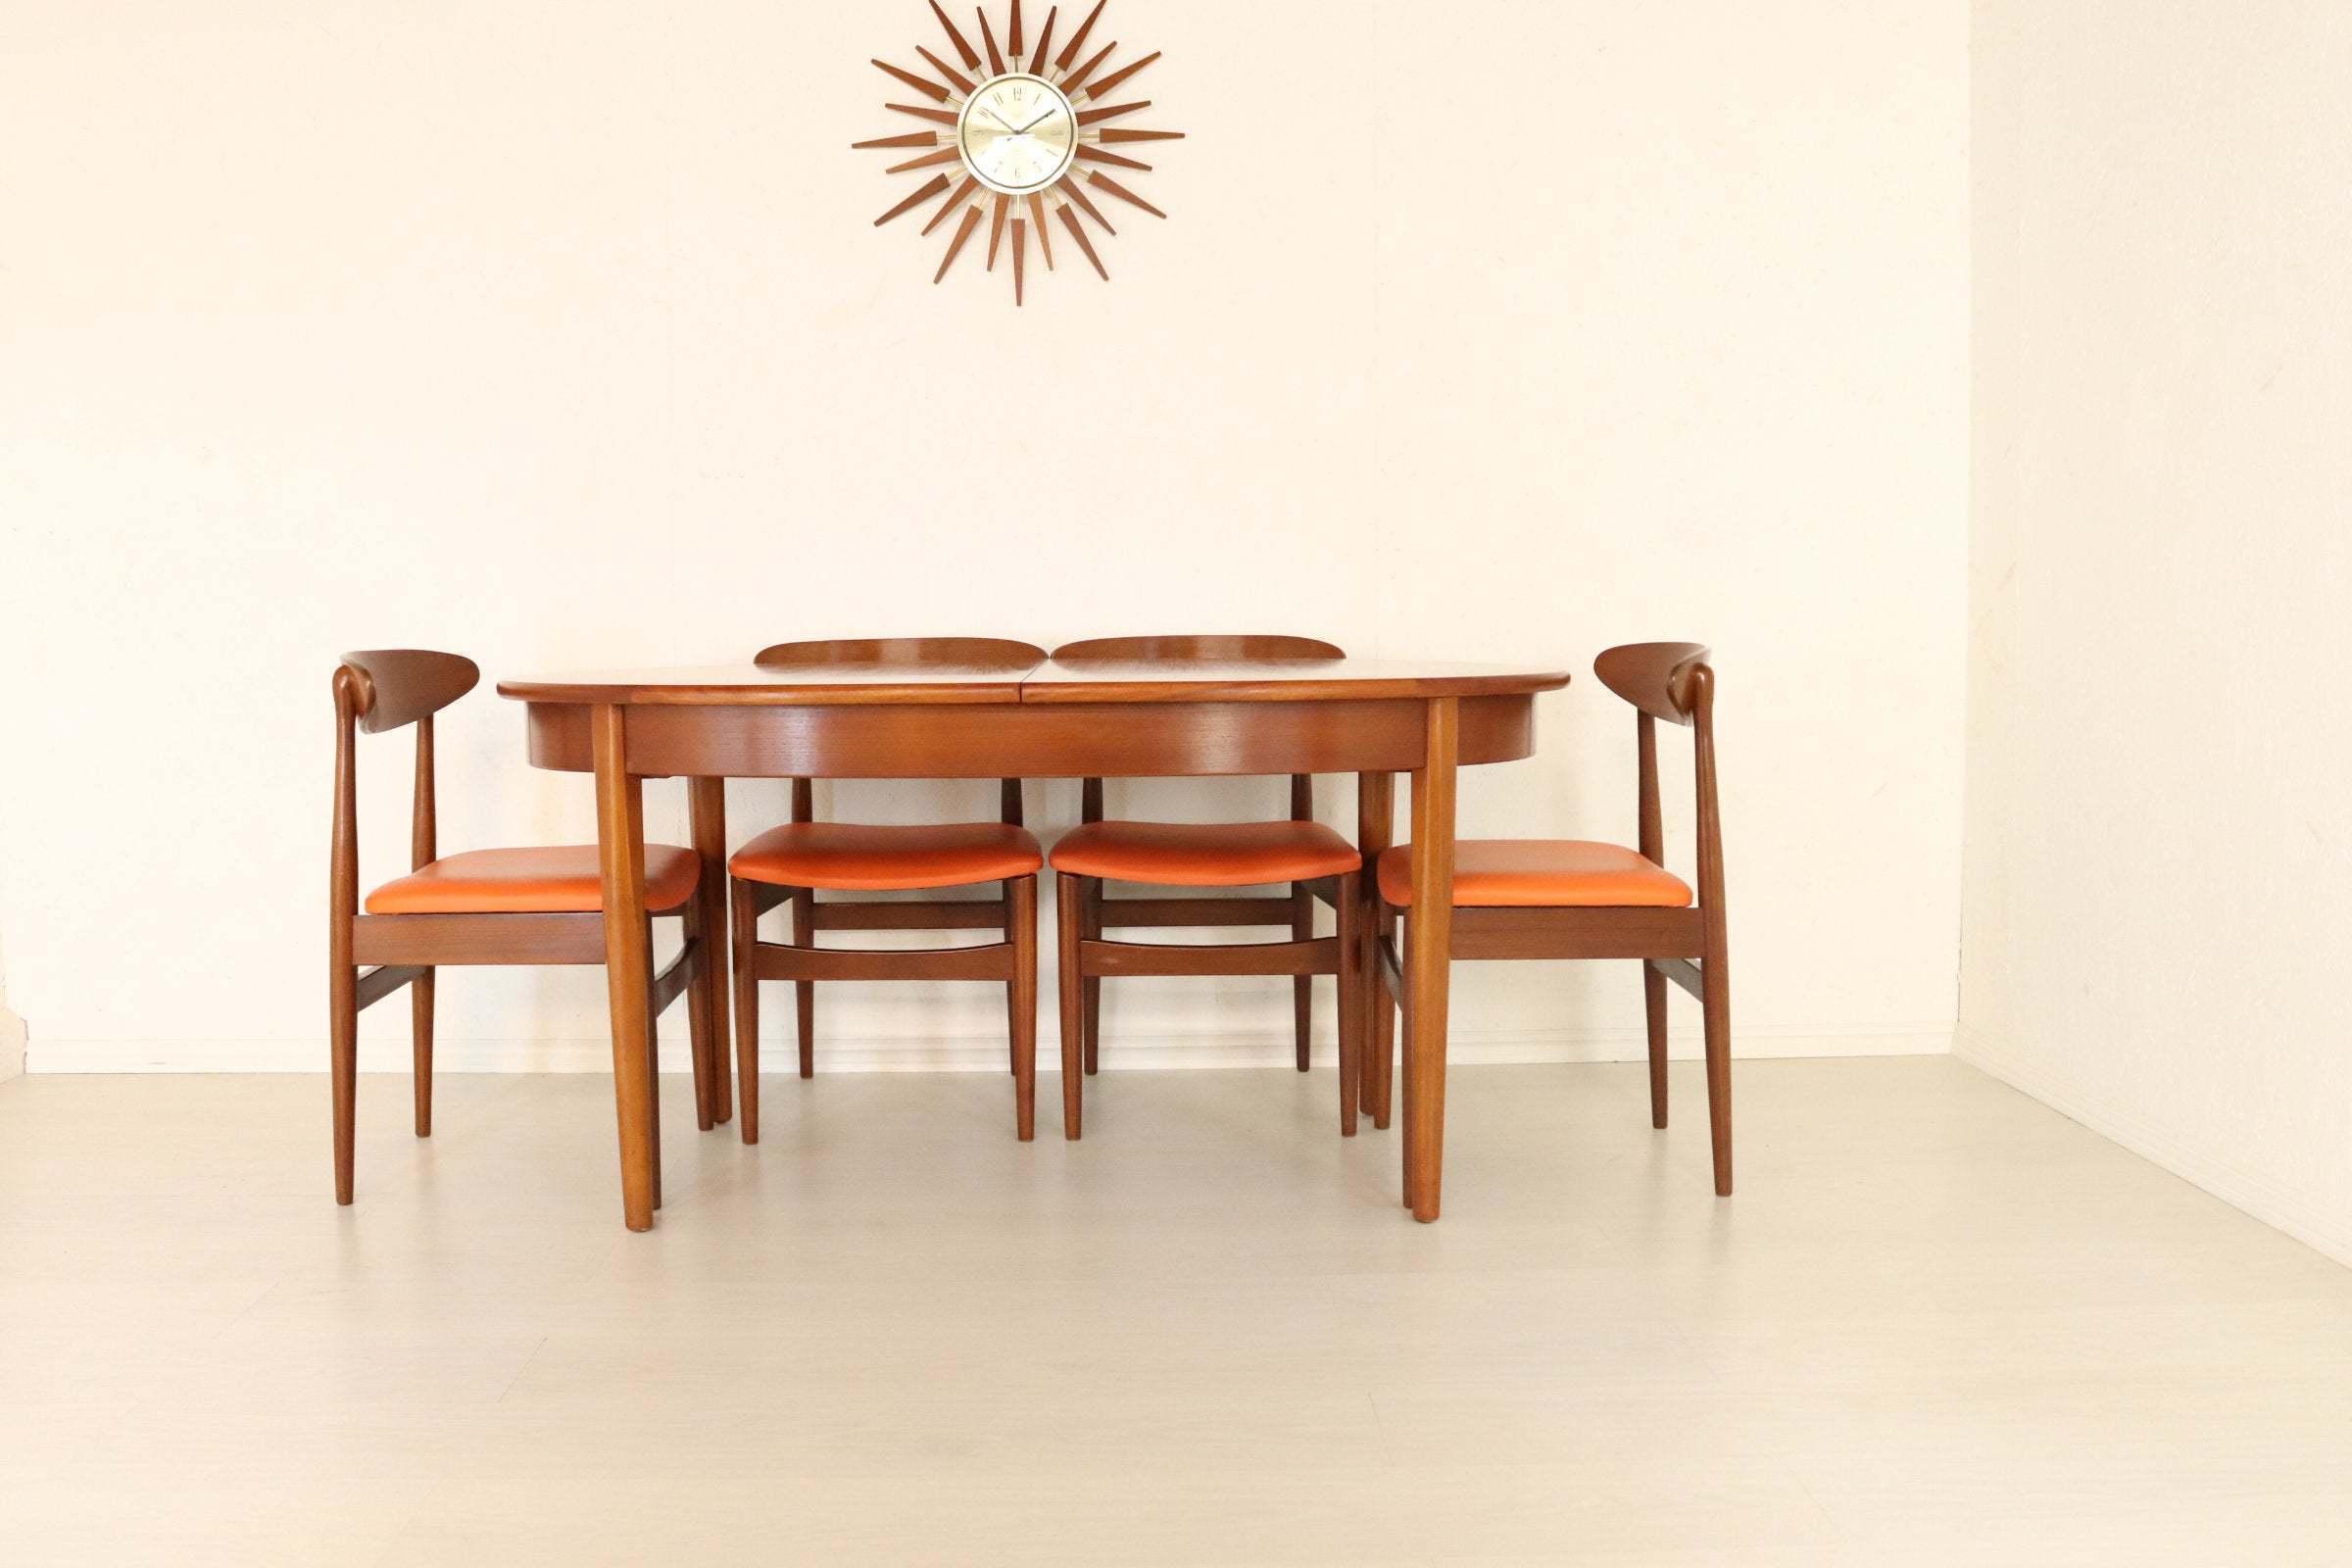 Mid Century Teak Jentique Extendable Dining Table Four Dining Chairs Orange Vinyl Retro Vintage Dining Set Refurbished Condition Jentique Vinterior